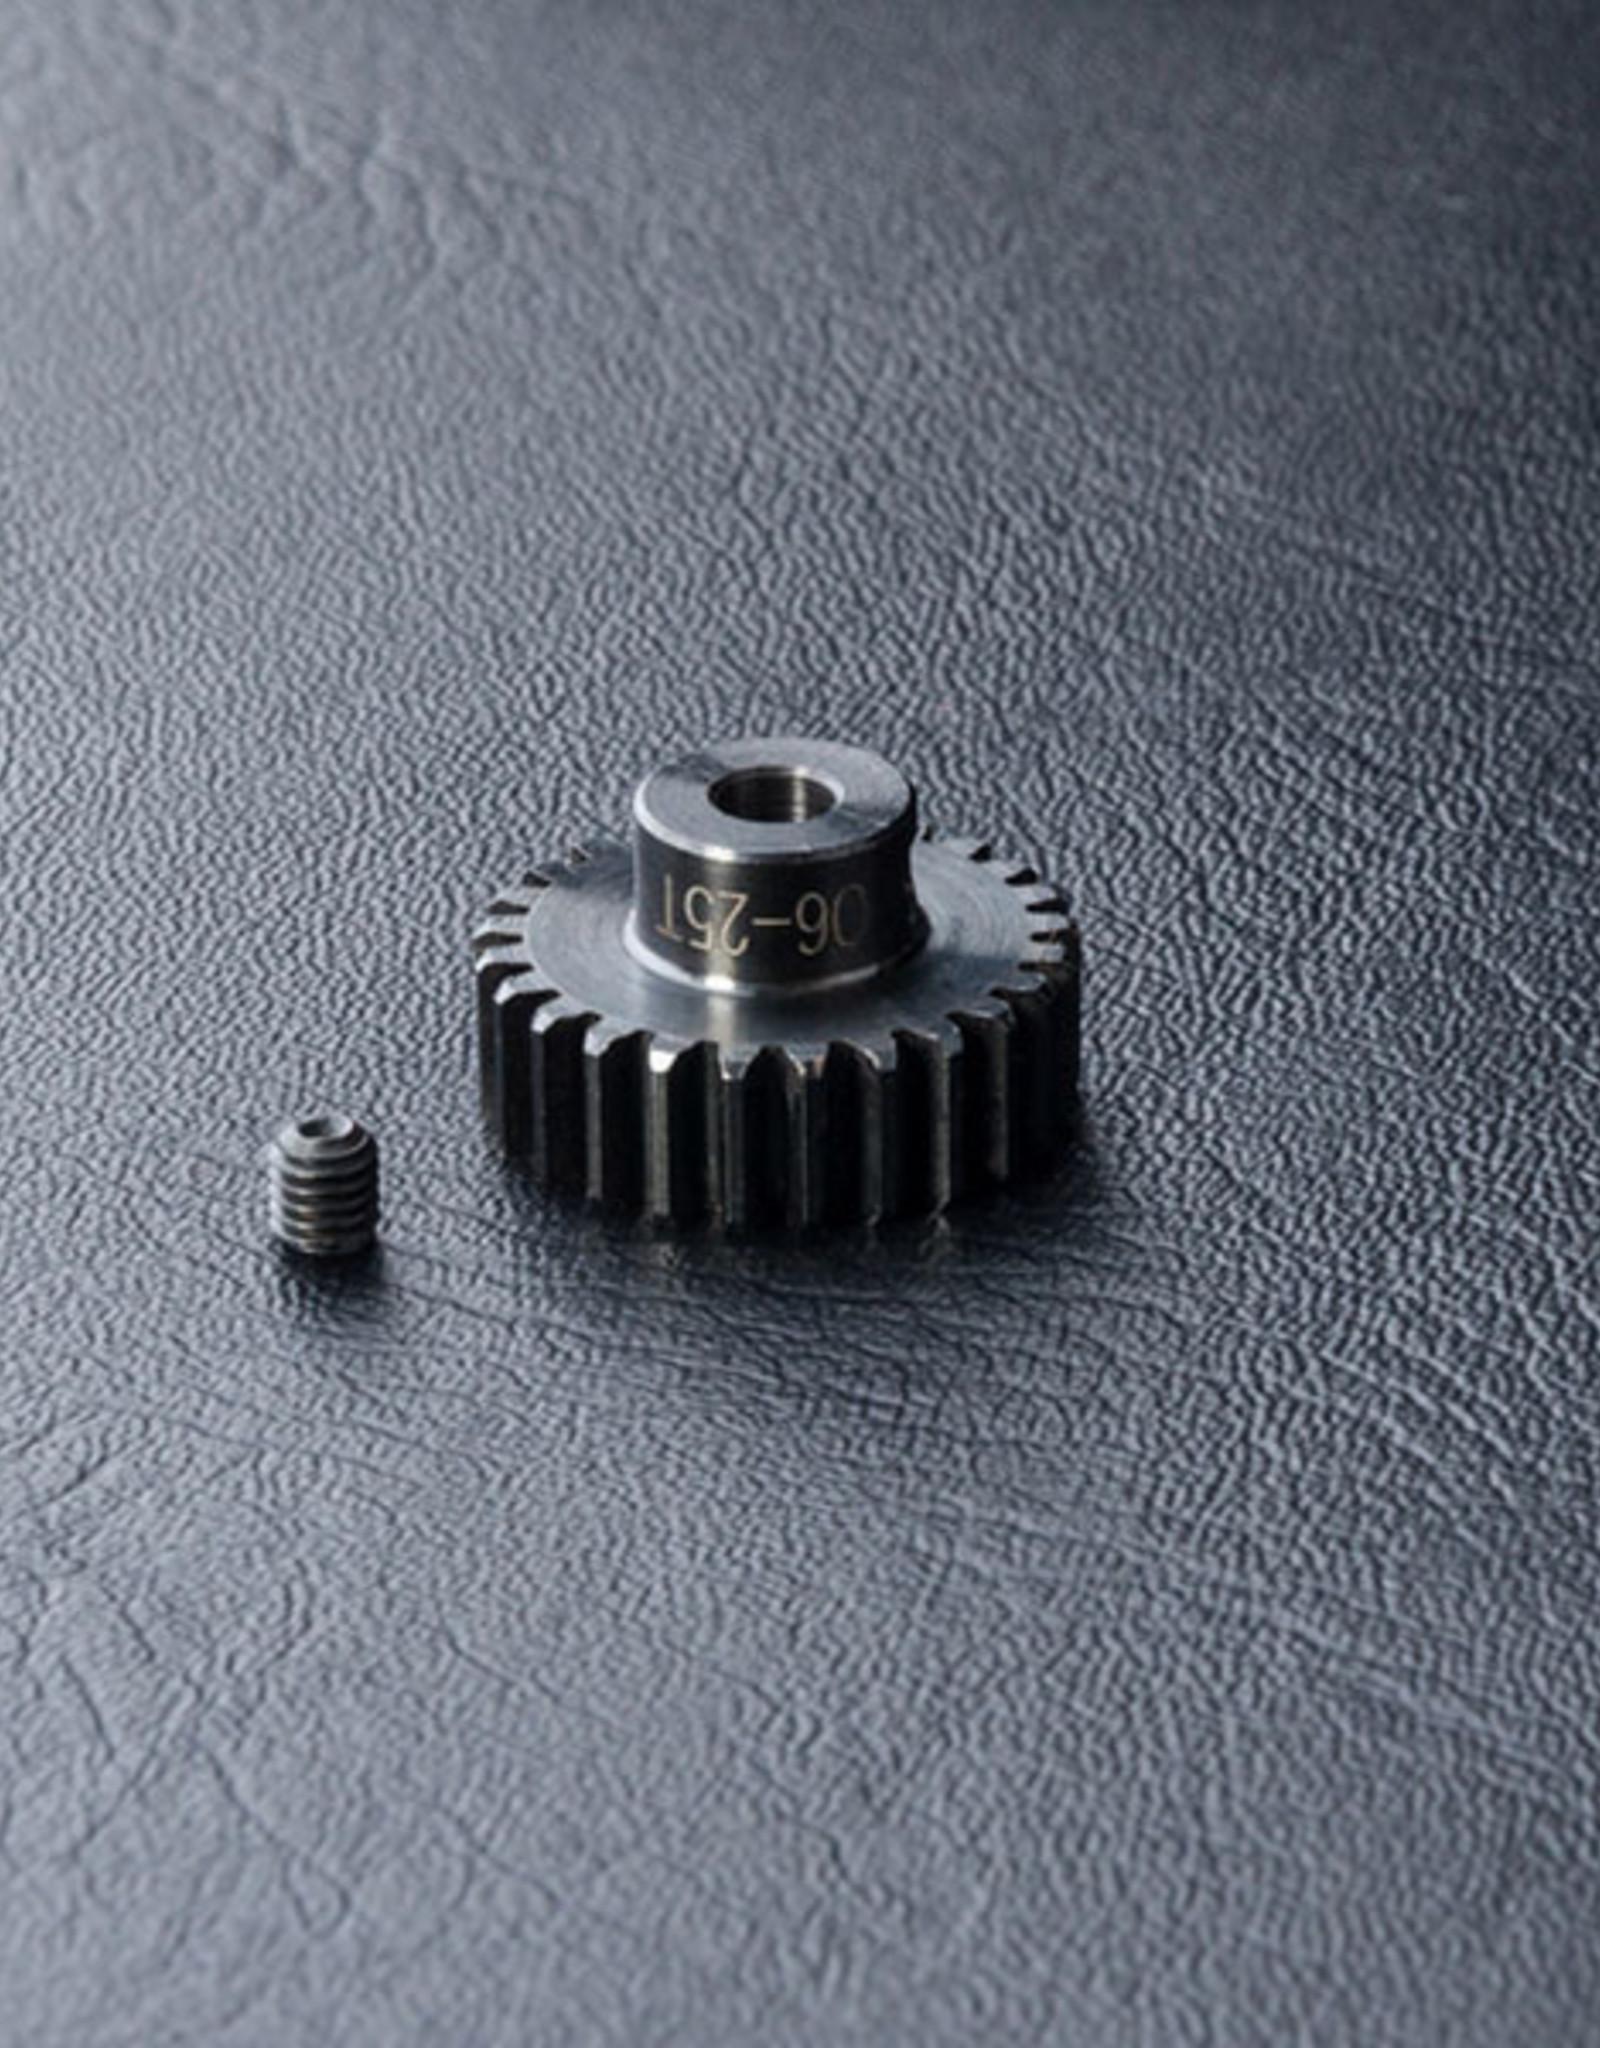 MST MXSPD106025 MST M06 Pinion 25T by MST 106025